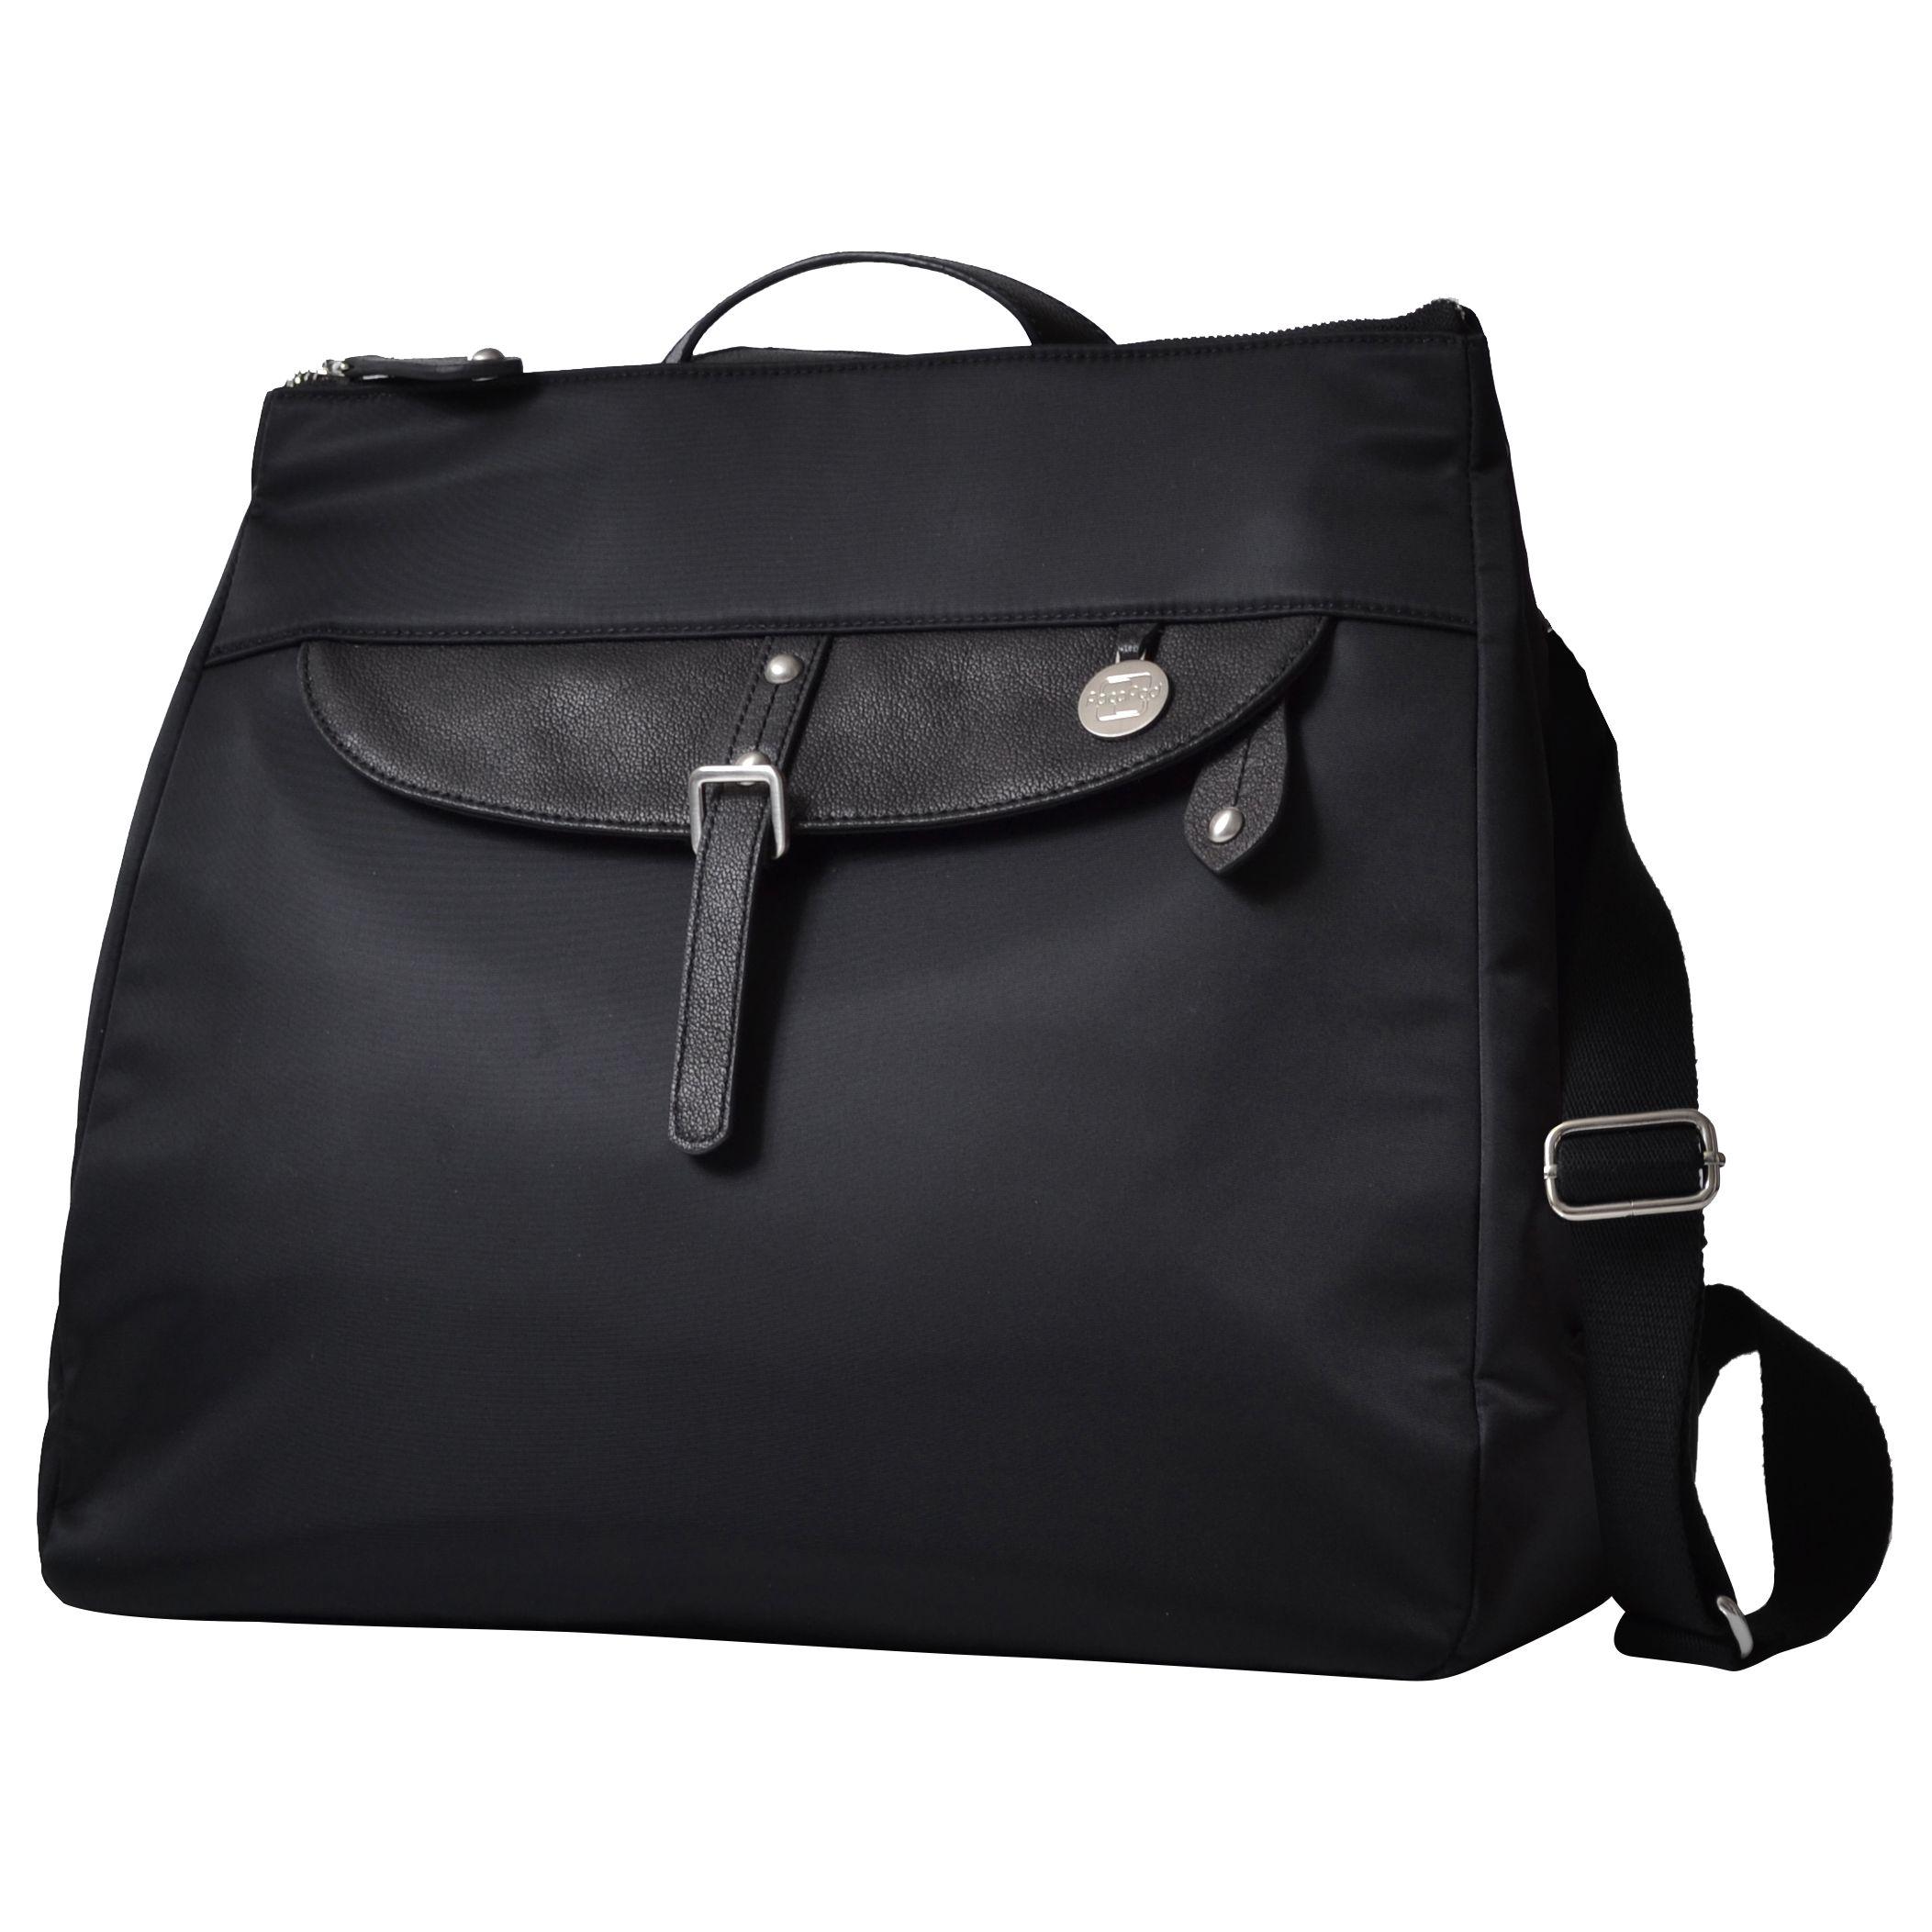 PacaPod PacaPod Gladstone Changing Bag, Black